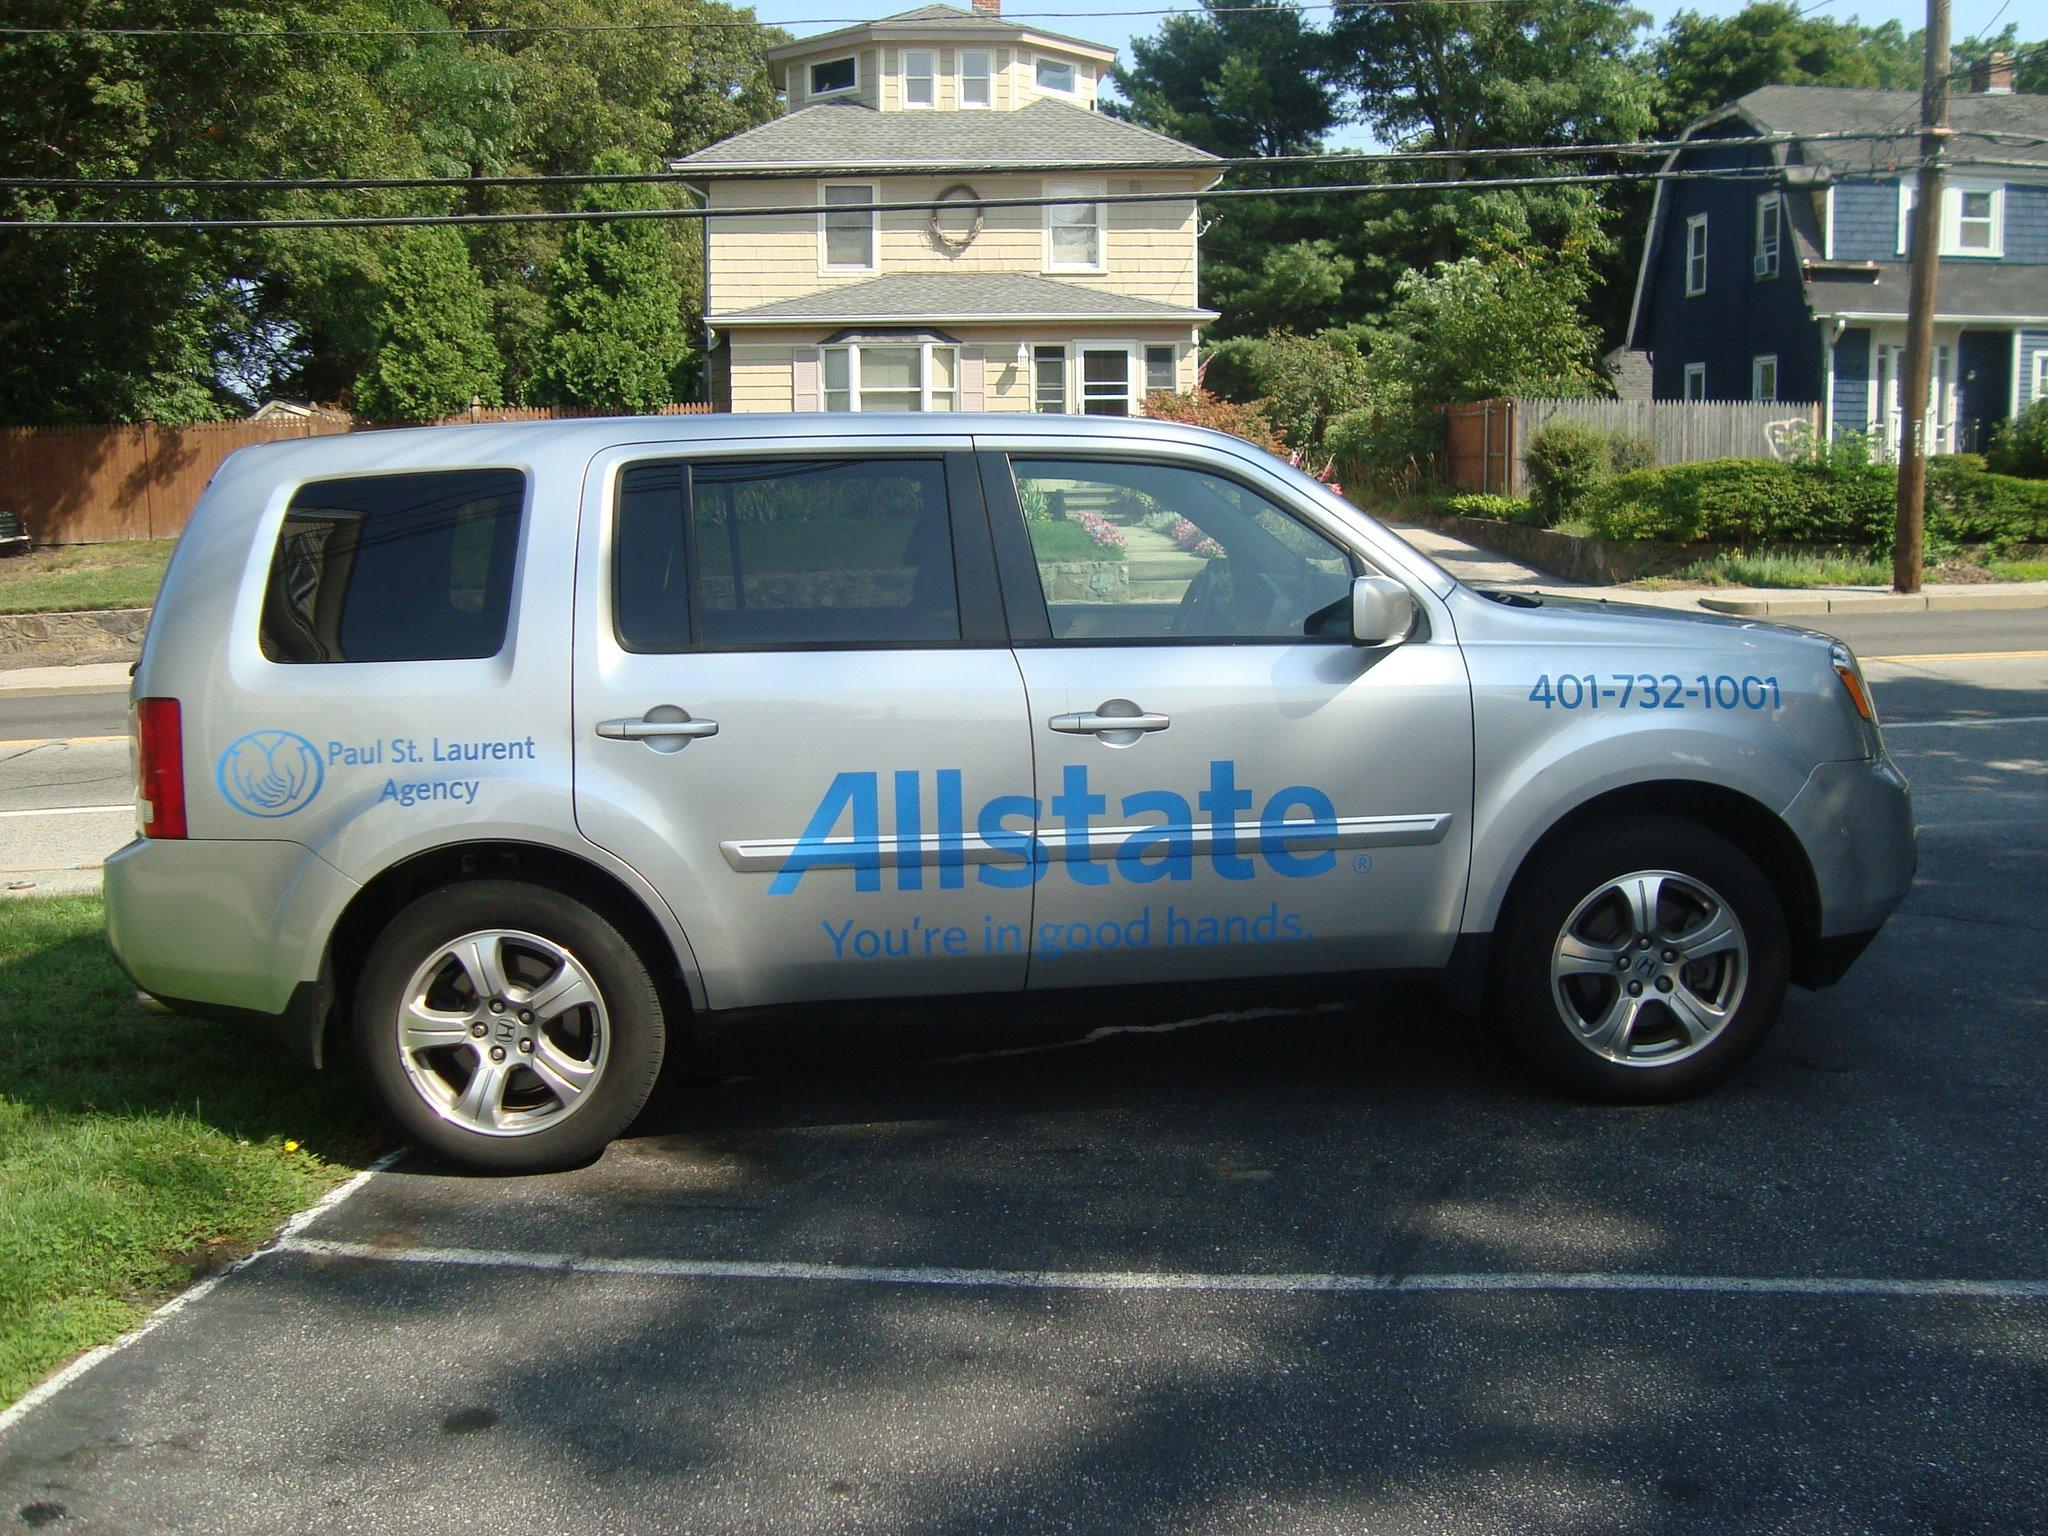 Allstate Insurance Agent Paul St Laurent In Warwick Ri